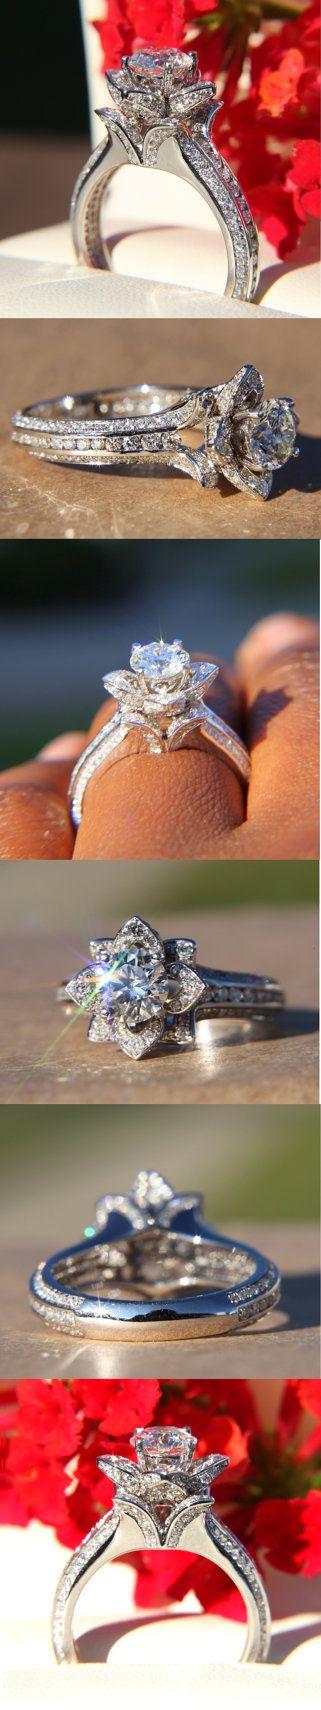 Rose Diamond Ring! Love this ring